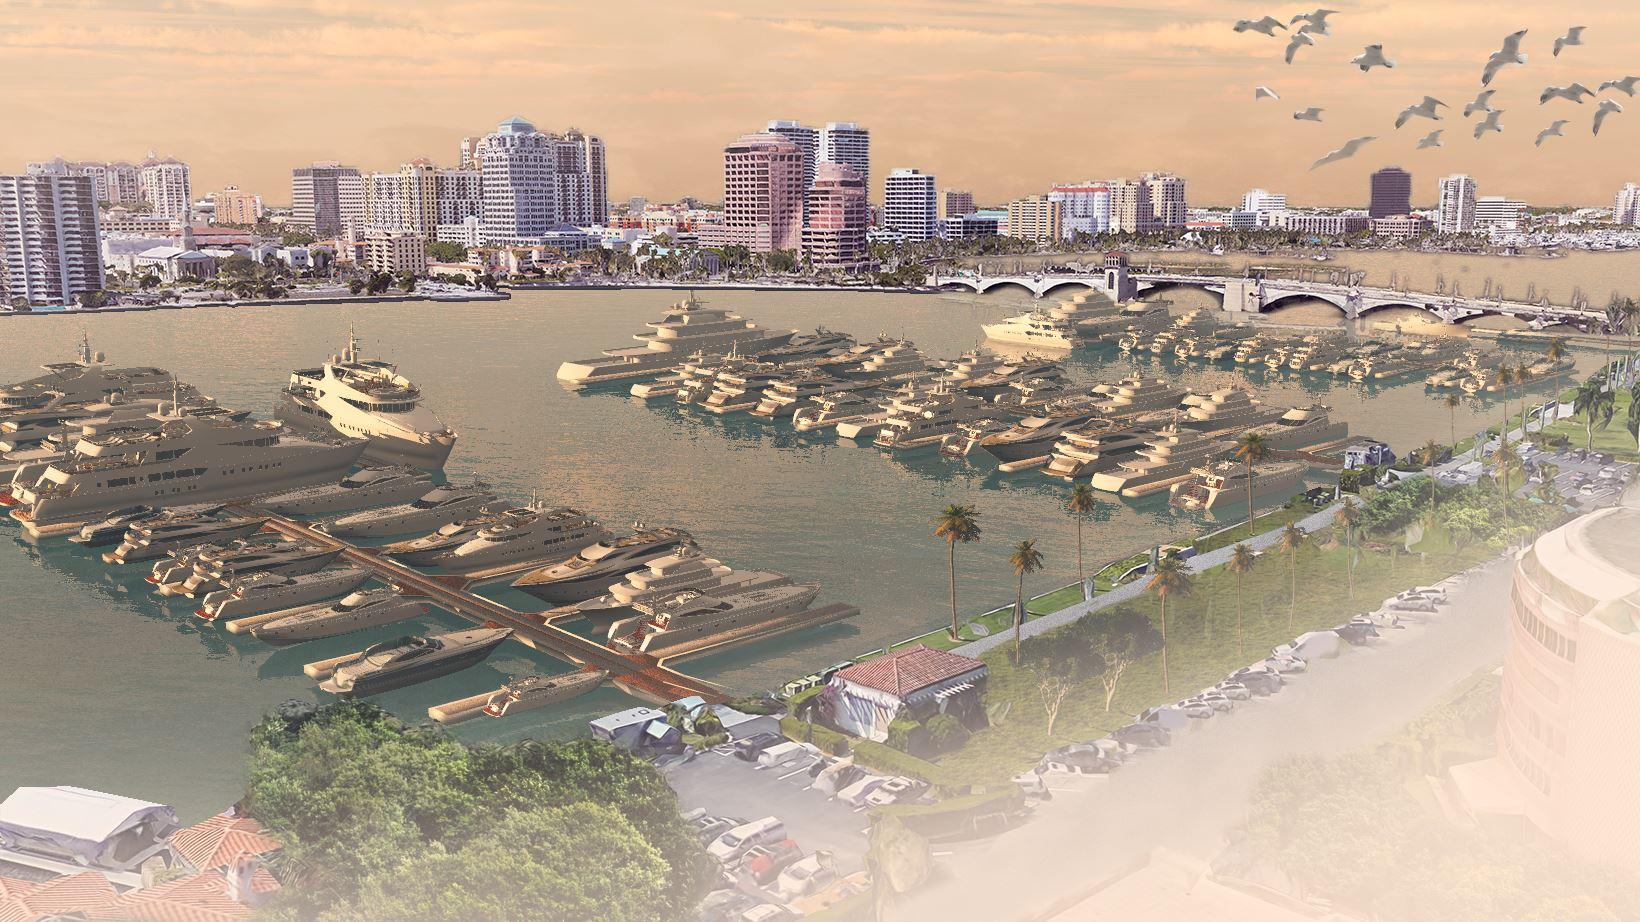 artists impression of Palm Beach Marina renovations